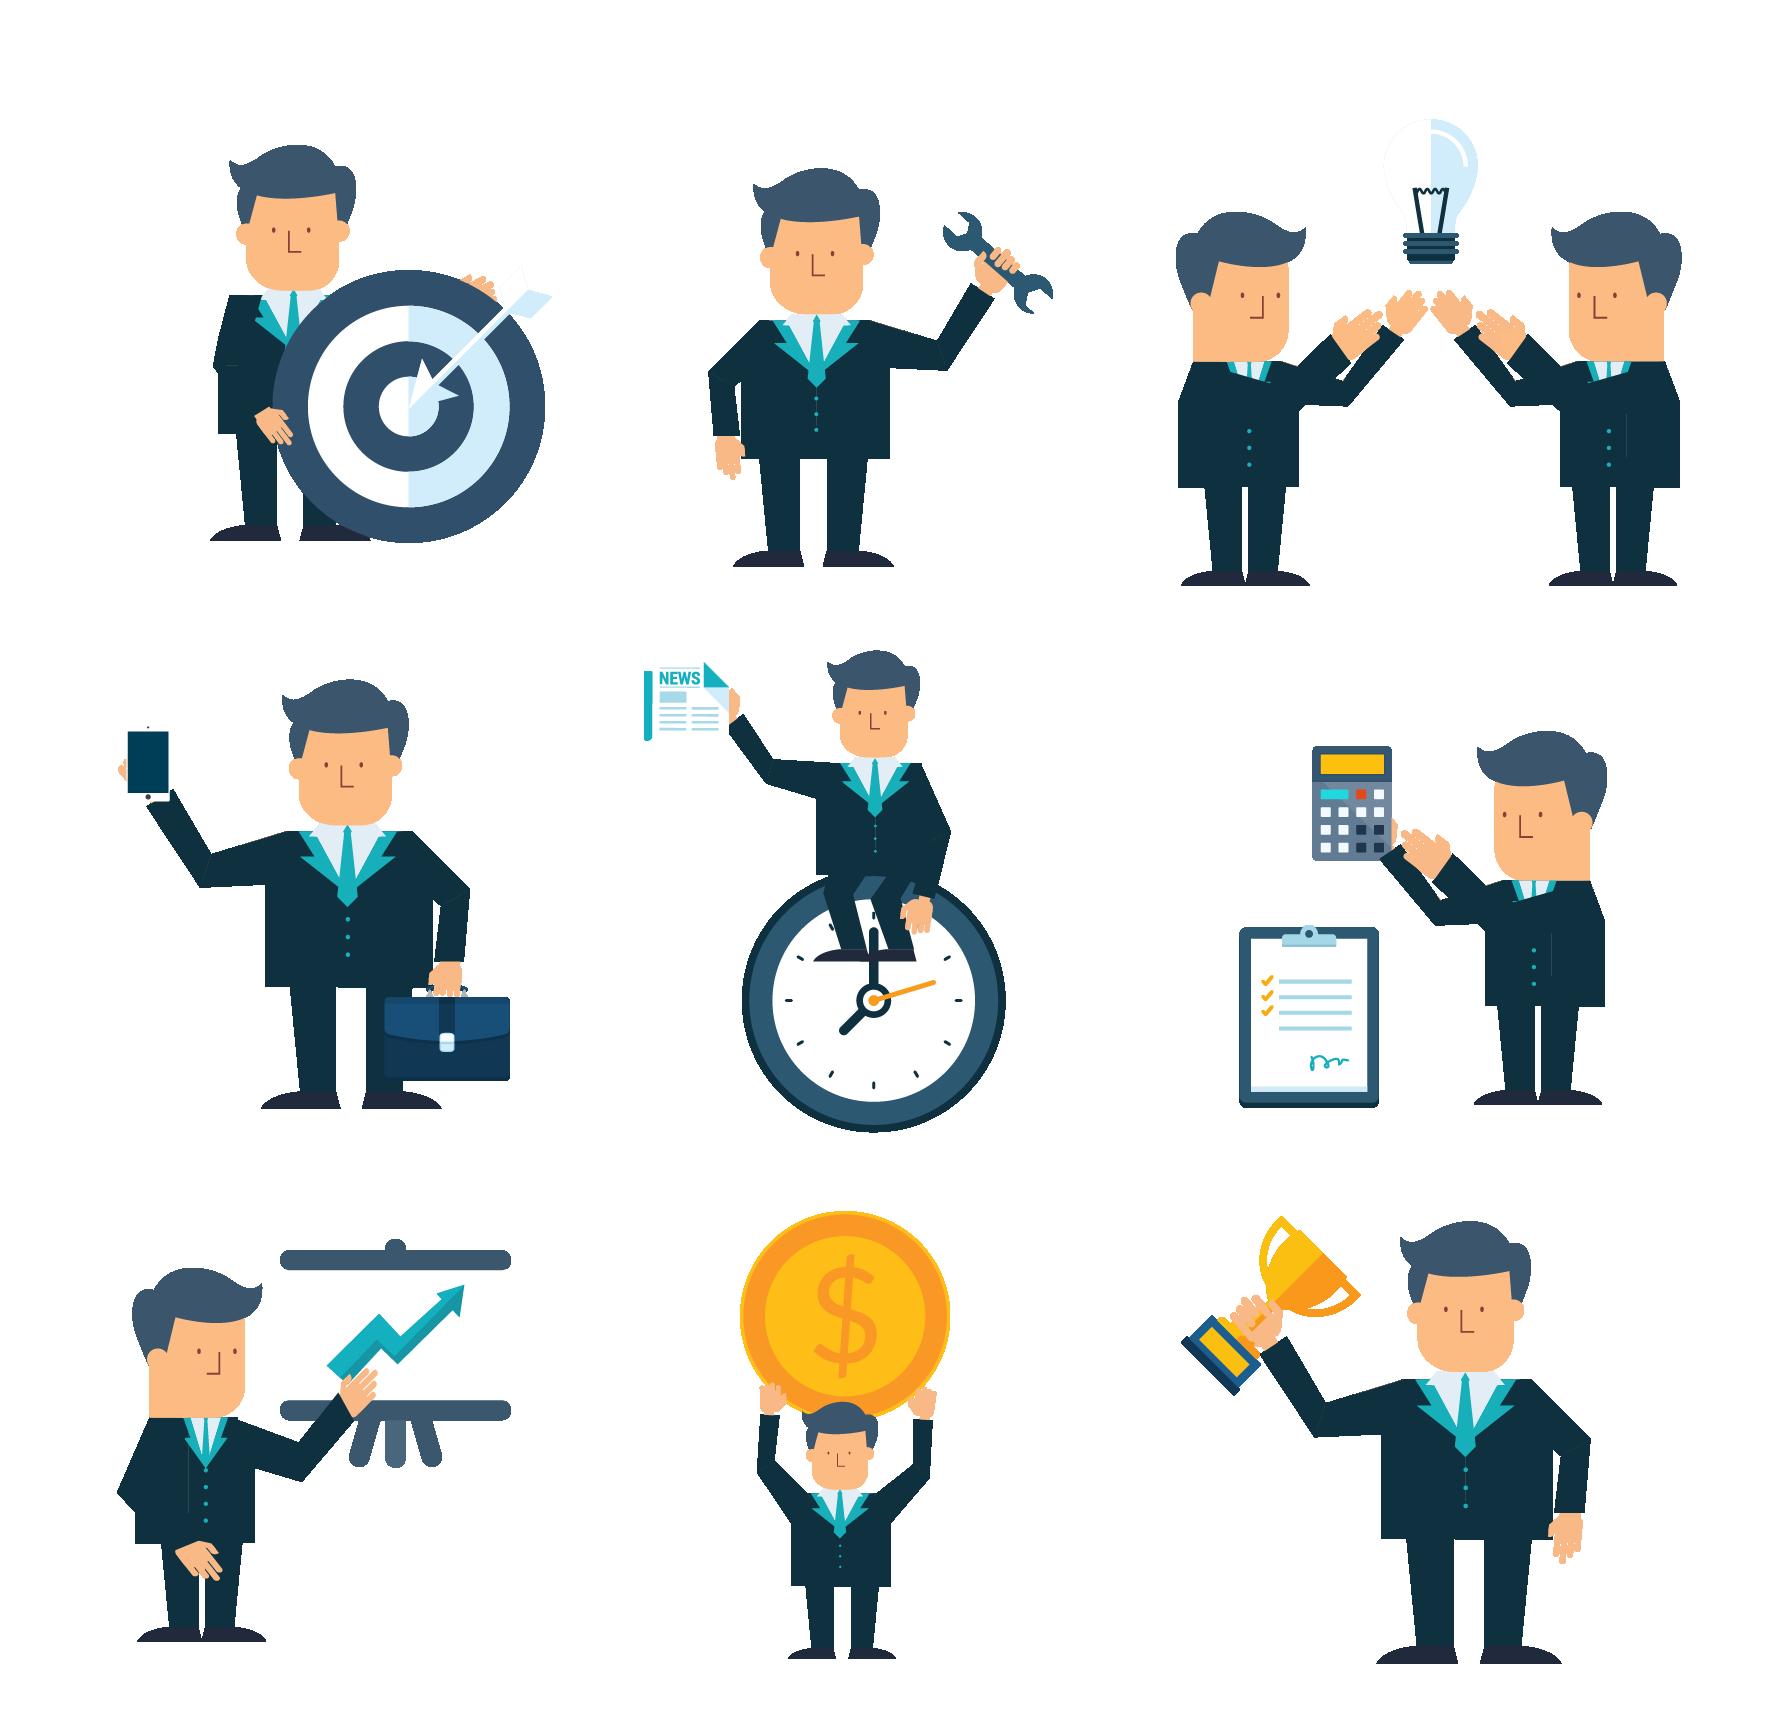 Businessperson icon man transprent. Collaboration clipart business organization